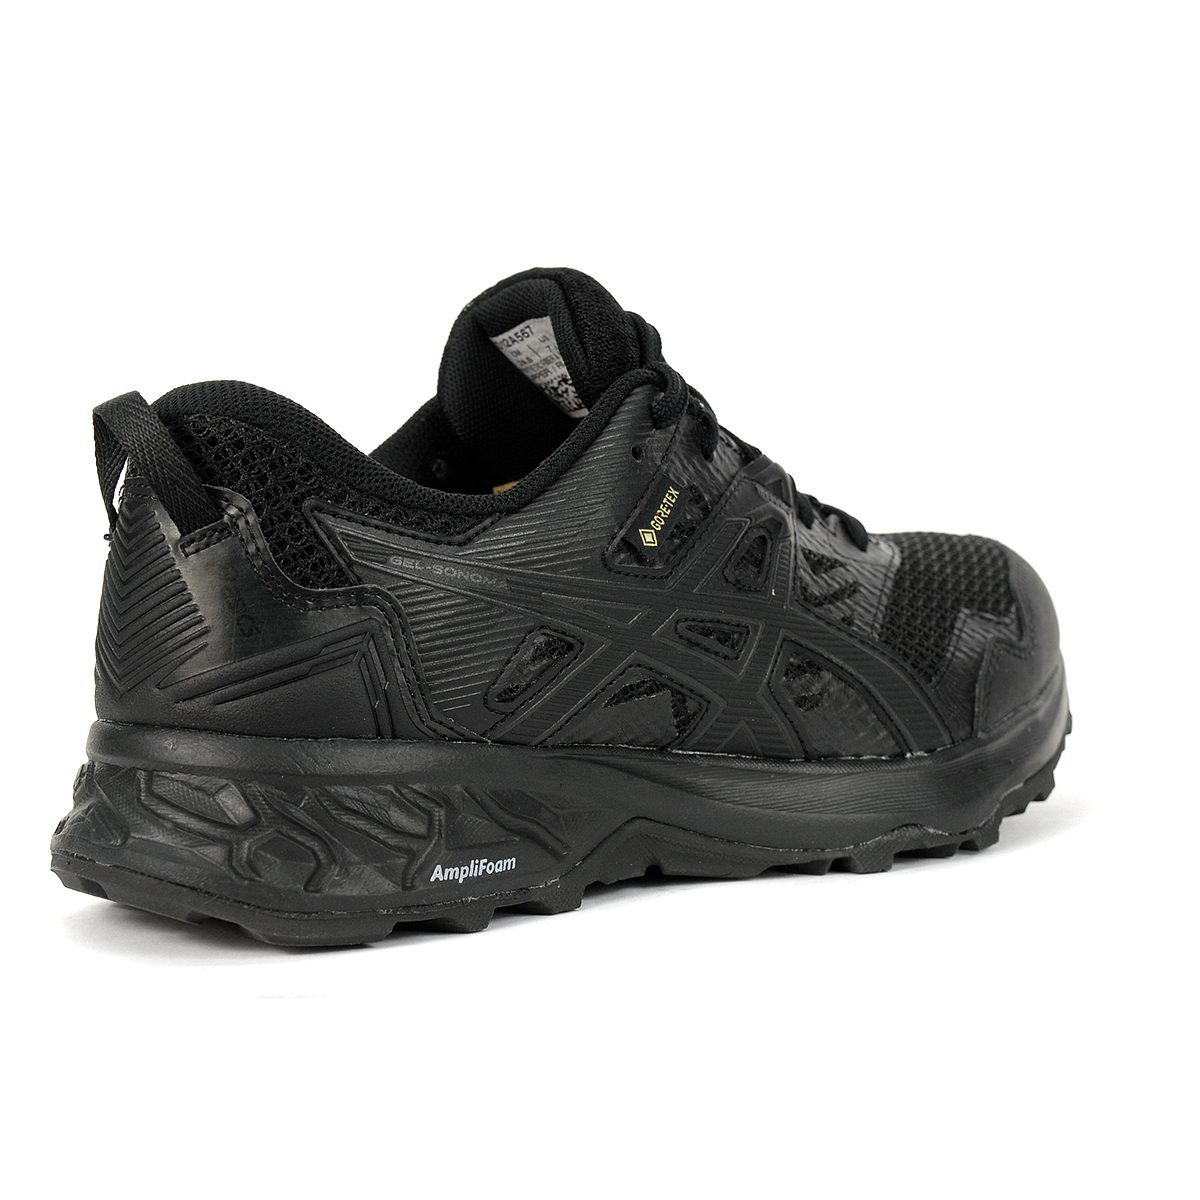 ASICS Women's Gel-Sonoma 5 GTX Black Trail Running Shoes 1012A567 ...